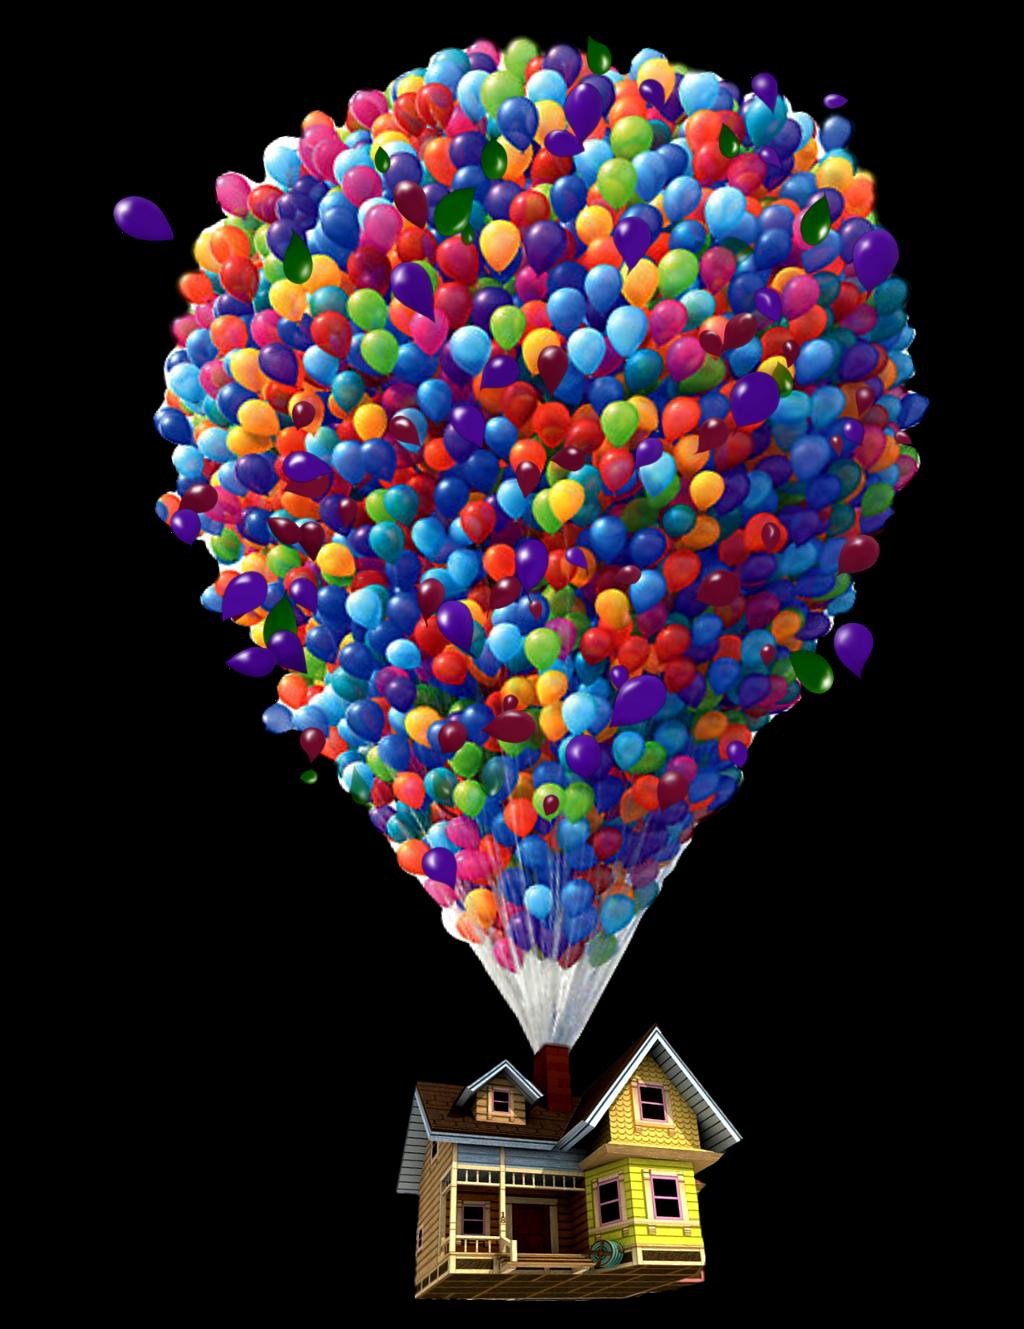 Ftestickers Balloon House Floating Levitation Danial89 Balloon House Disney Silhouette Art Up Pixar